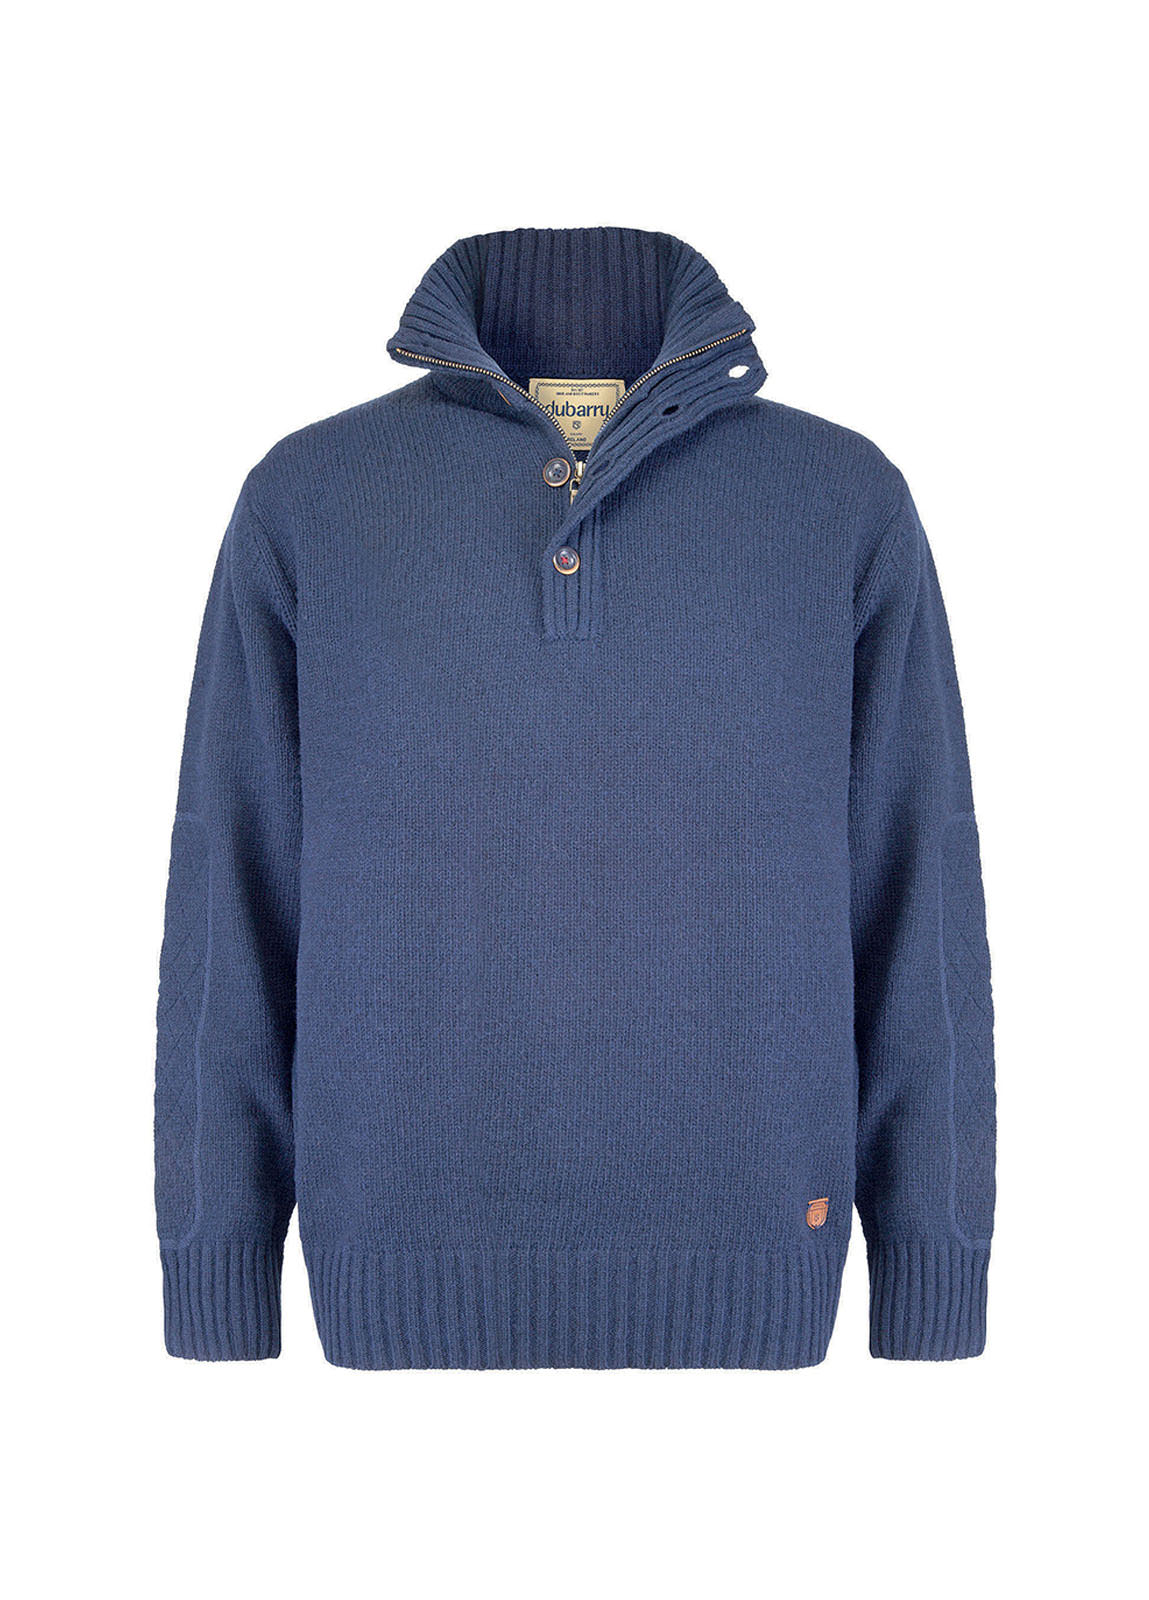 Shakelton Mens Sweater - Navy